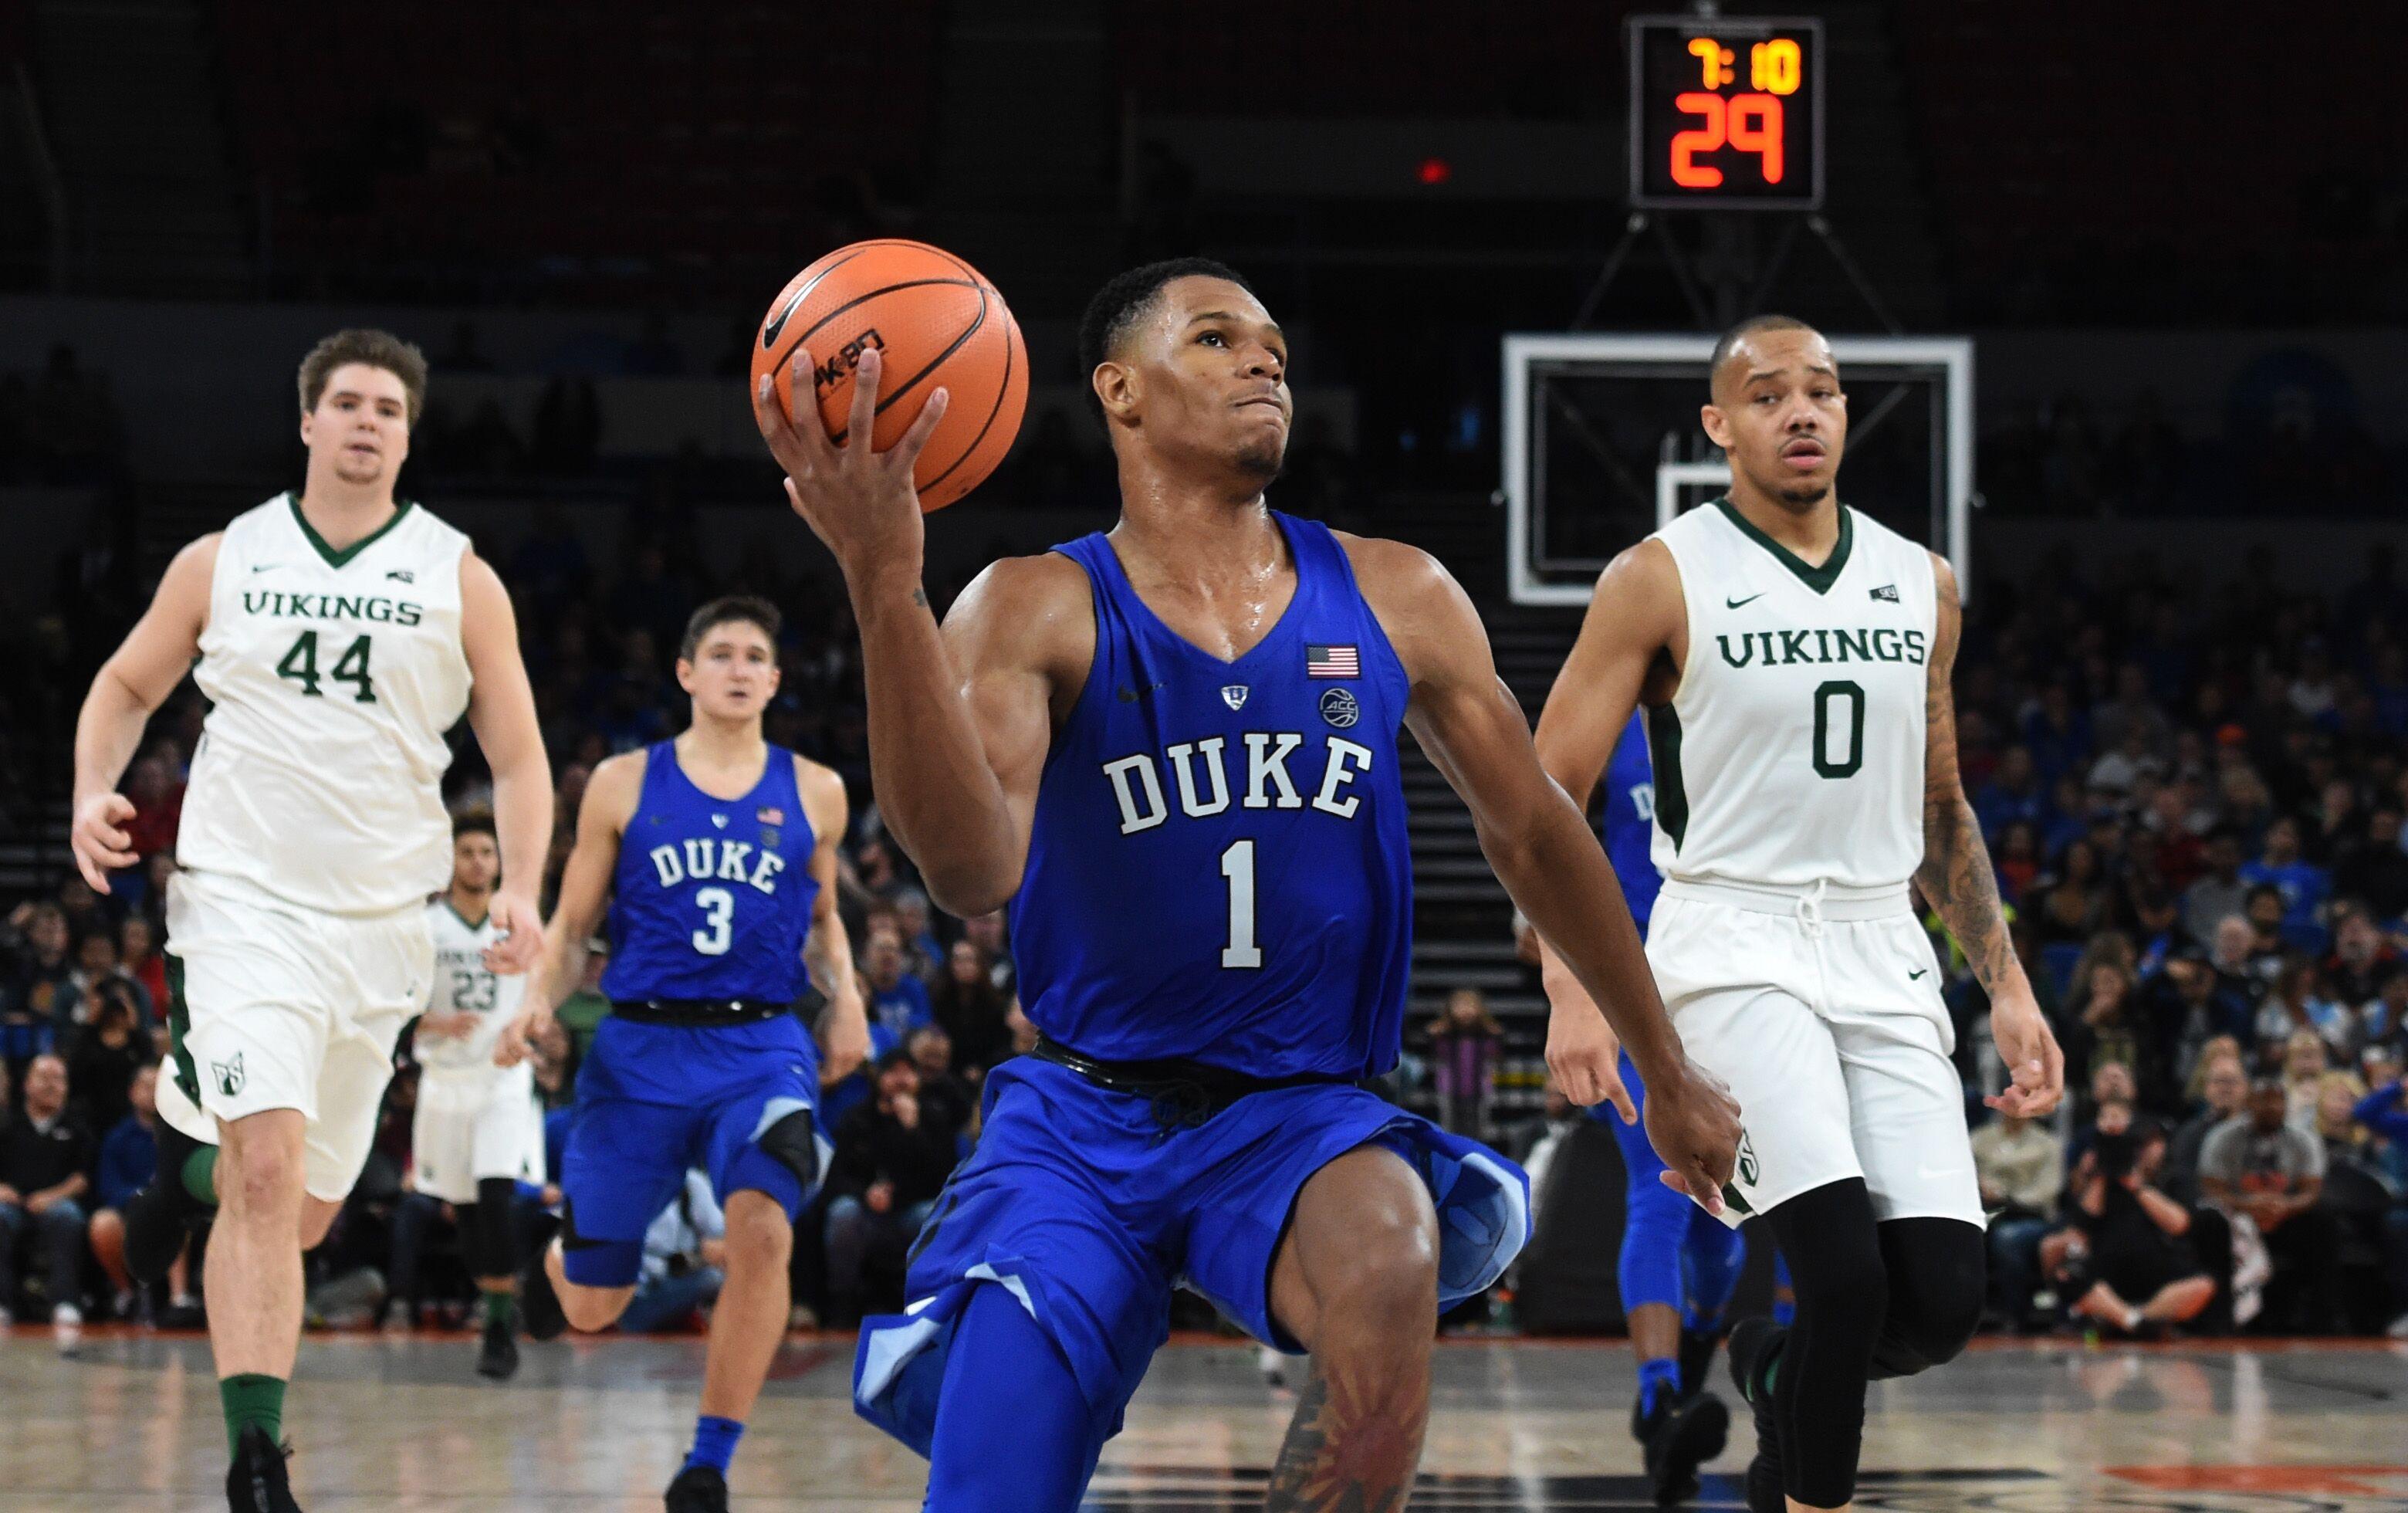 Duke Basketball: Trevon Duval Headed to the NBA